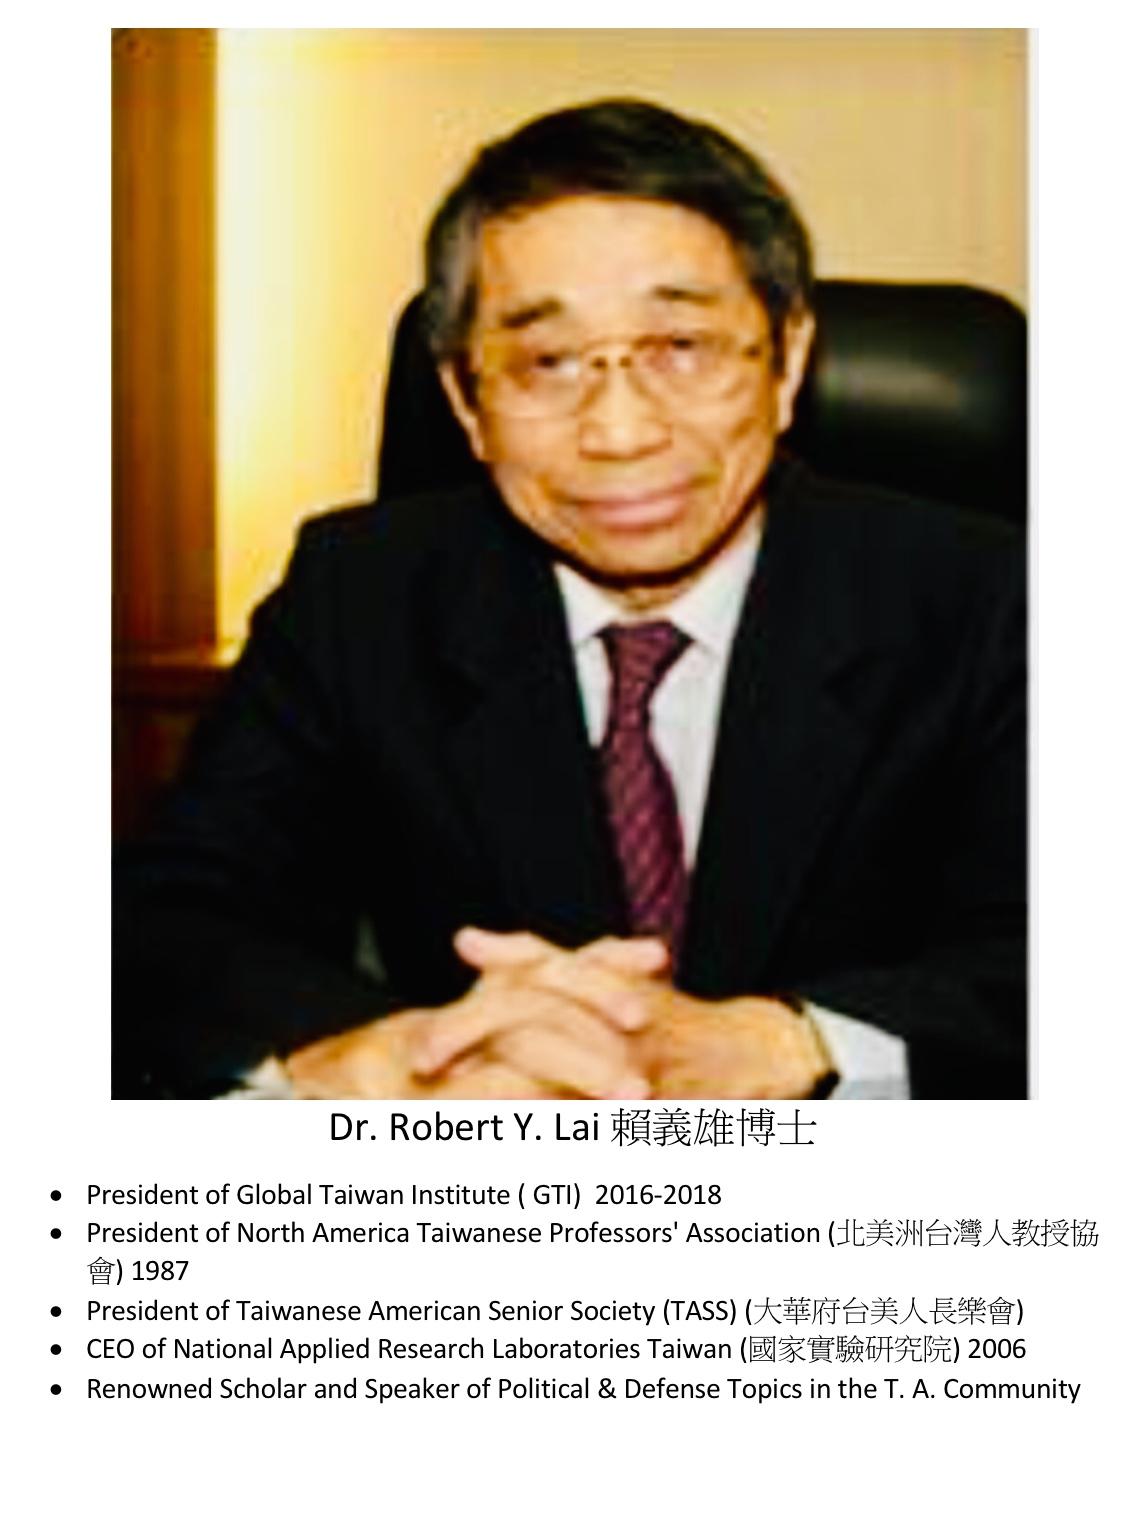 276. Dr. Robert Y. Lai 賴義雄博士